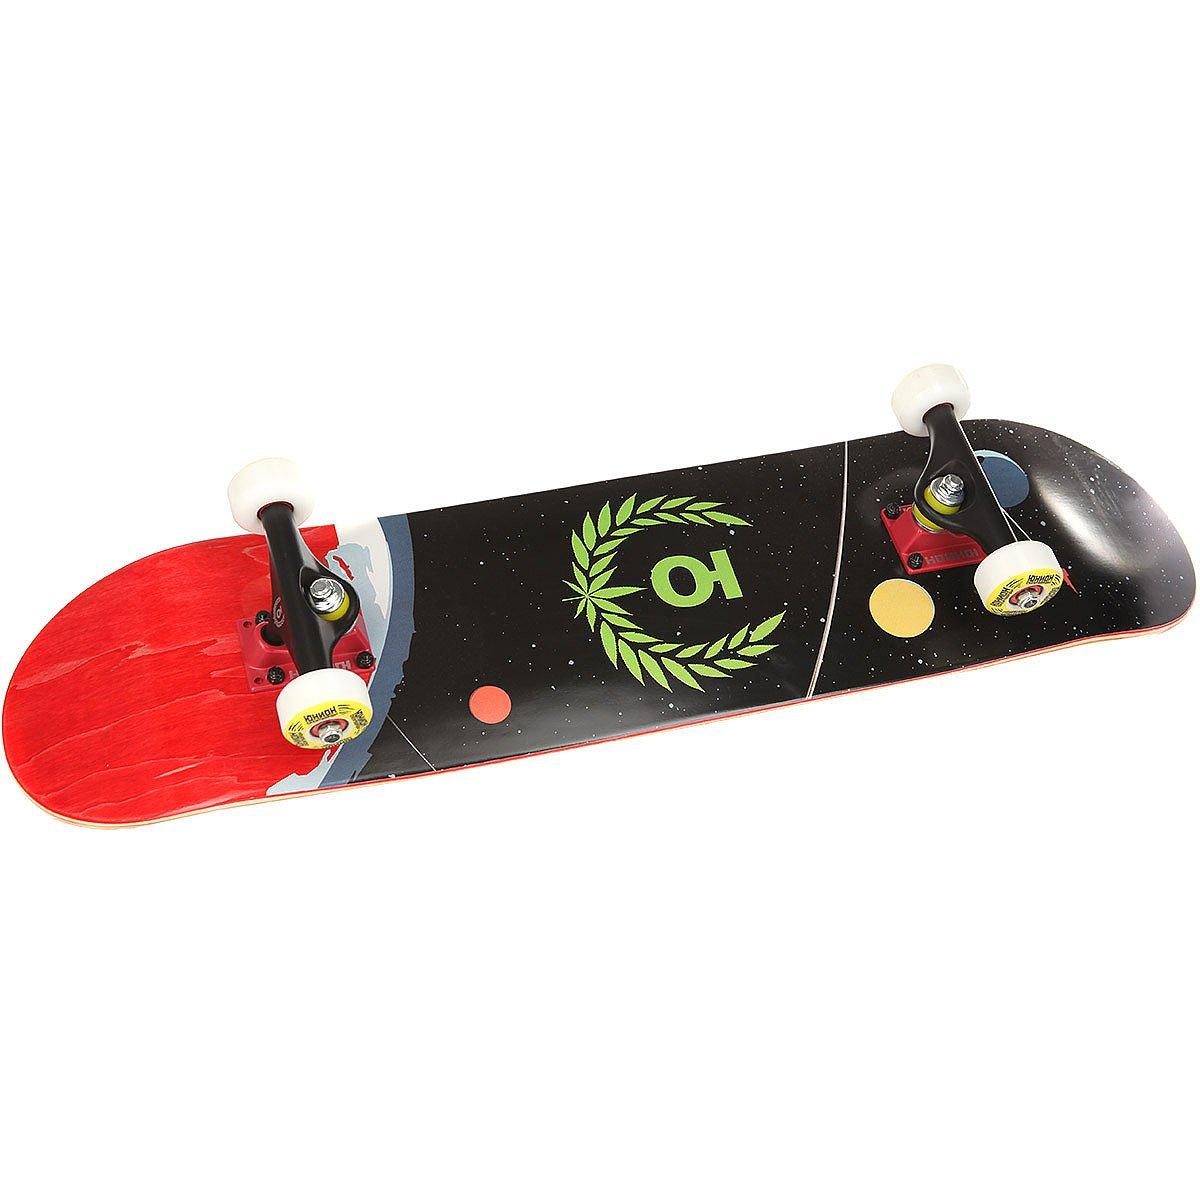 aa61a805339a60 Купить скейтборд в сборе юнион Space Black/Multi 31.25 x 7.6 (19.3 ...